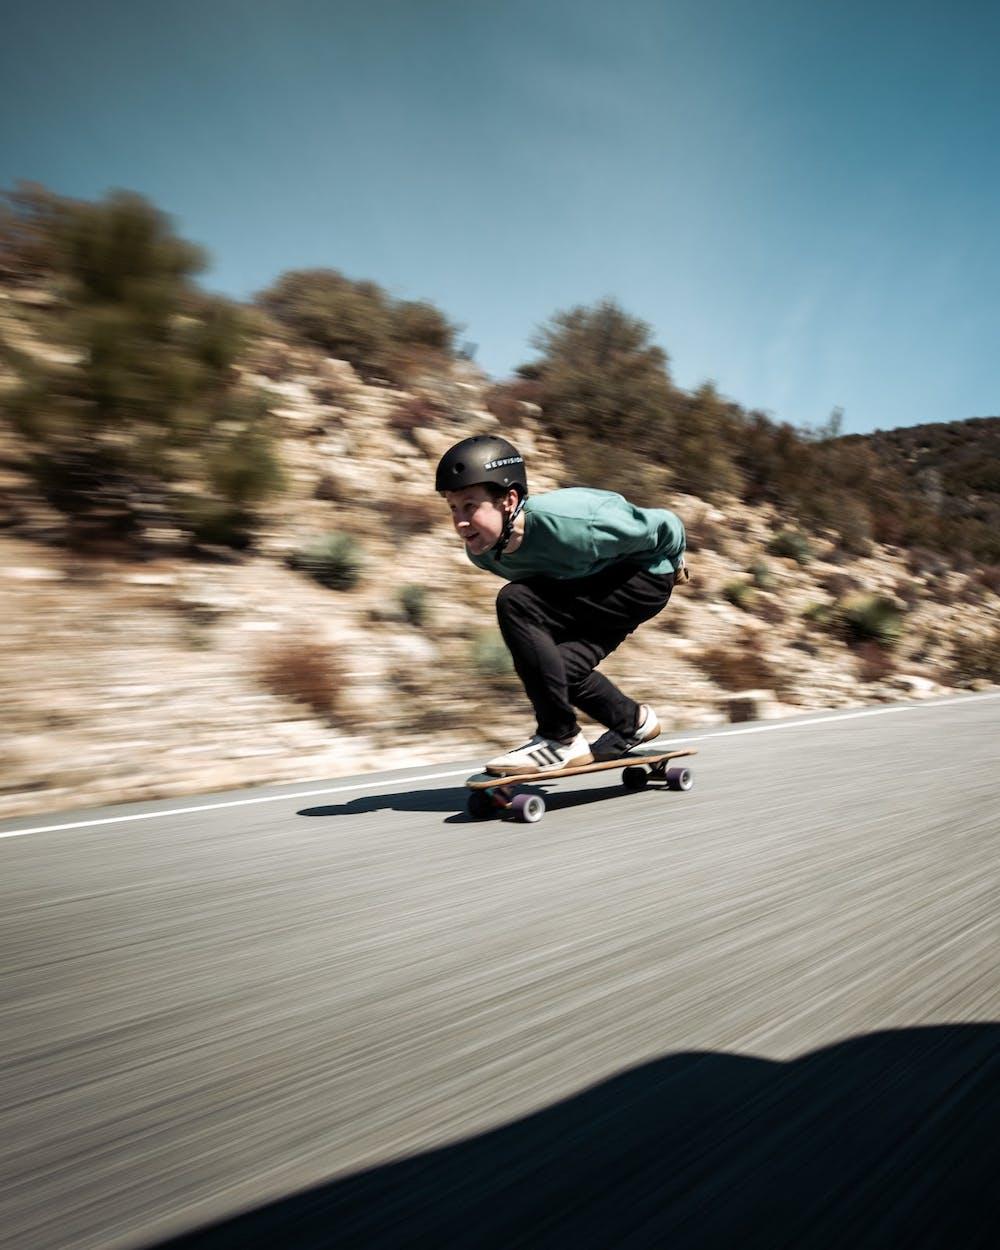 Student, filmmaker and adrenaline junkie Josh Neuman is facing his fears head-on